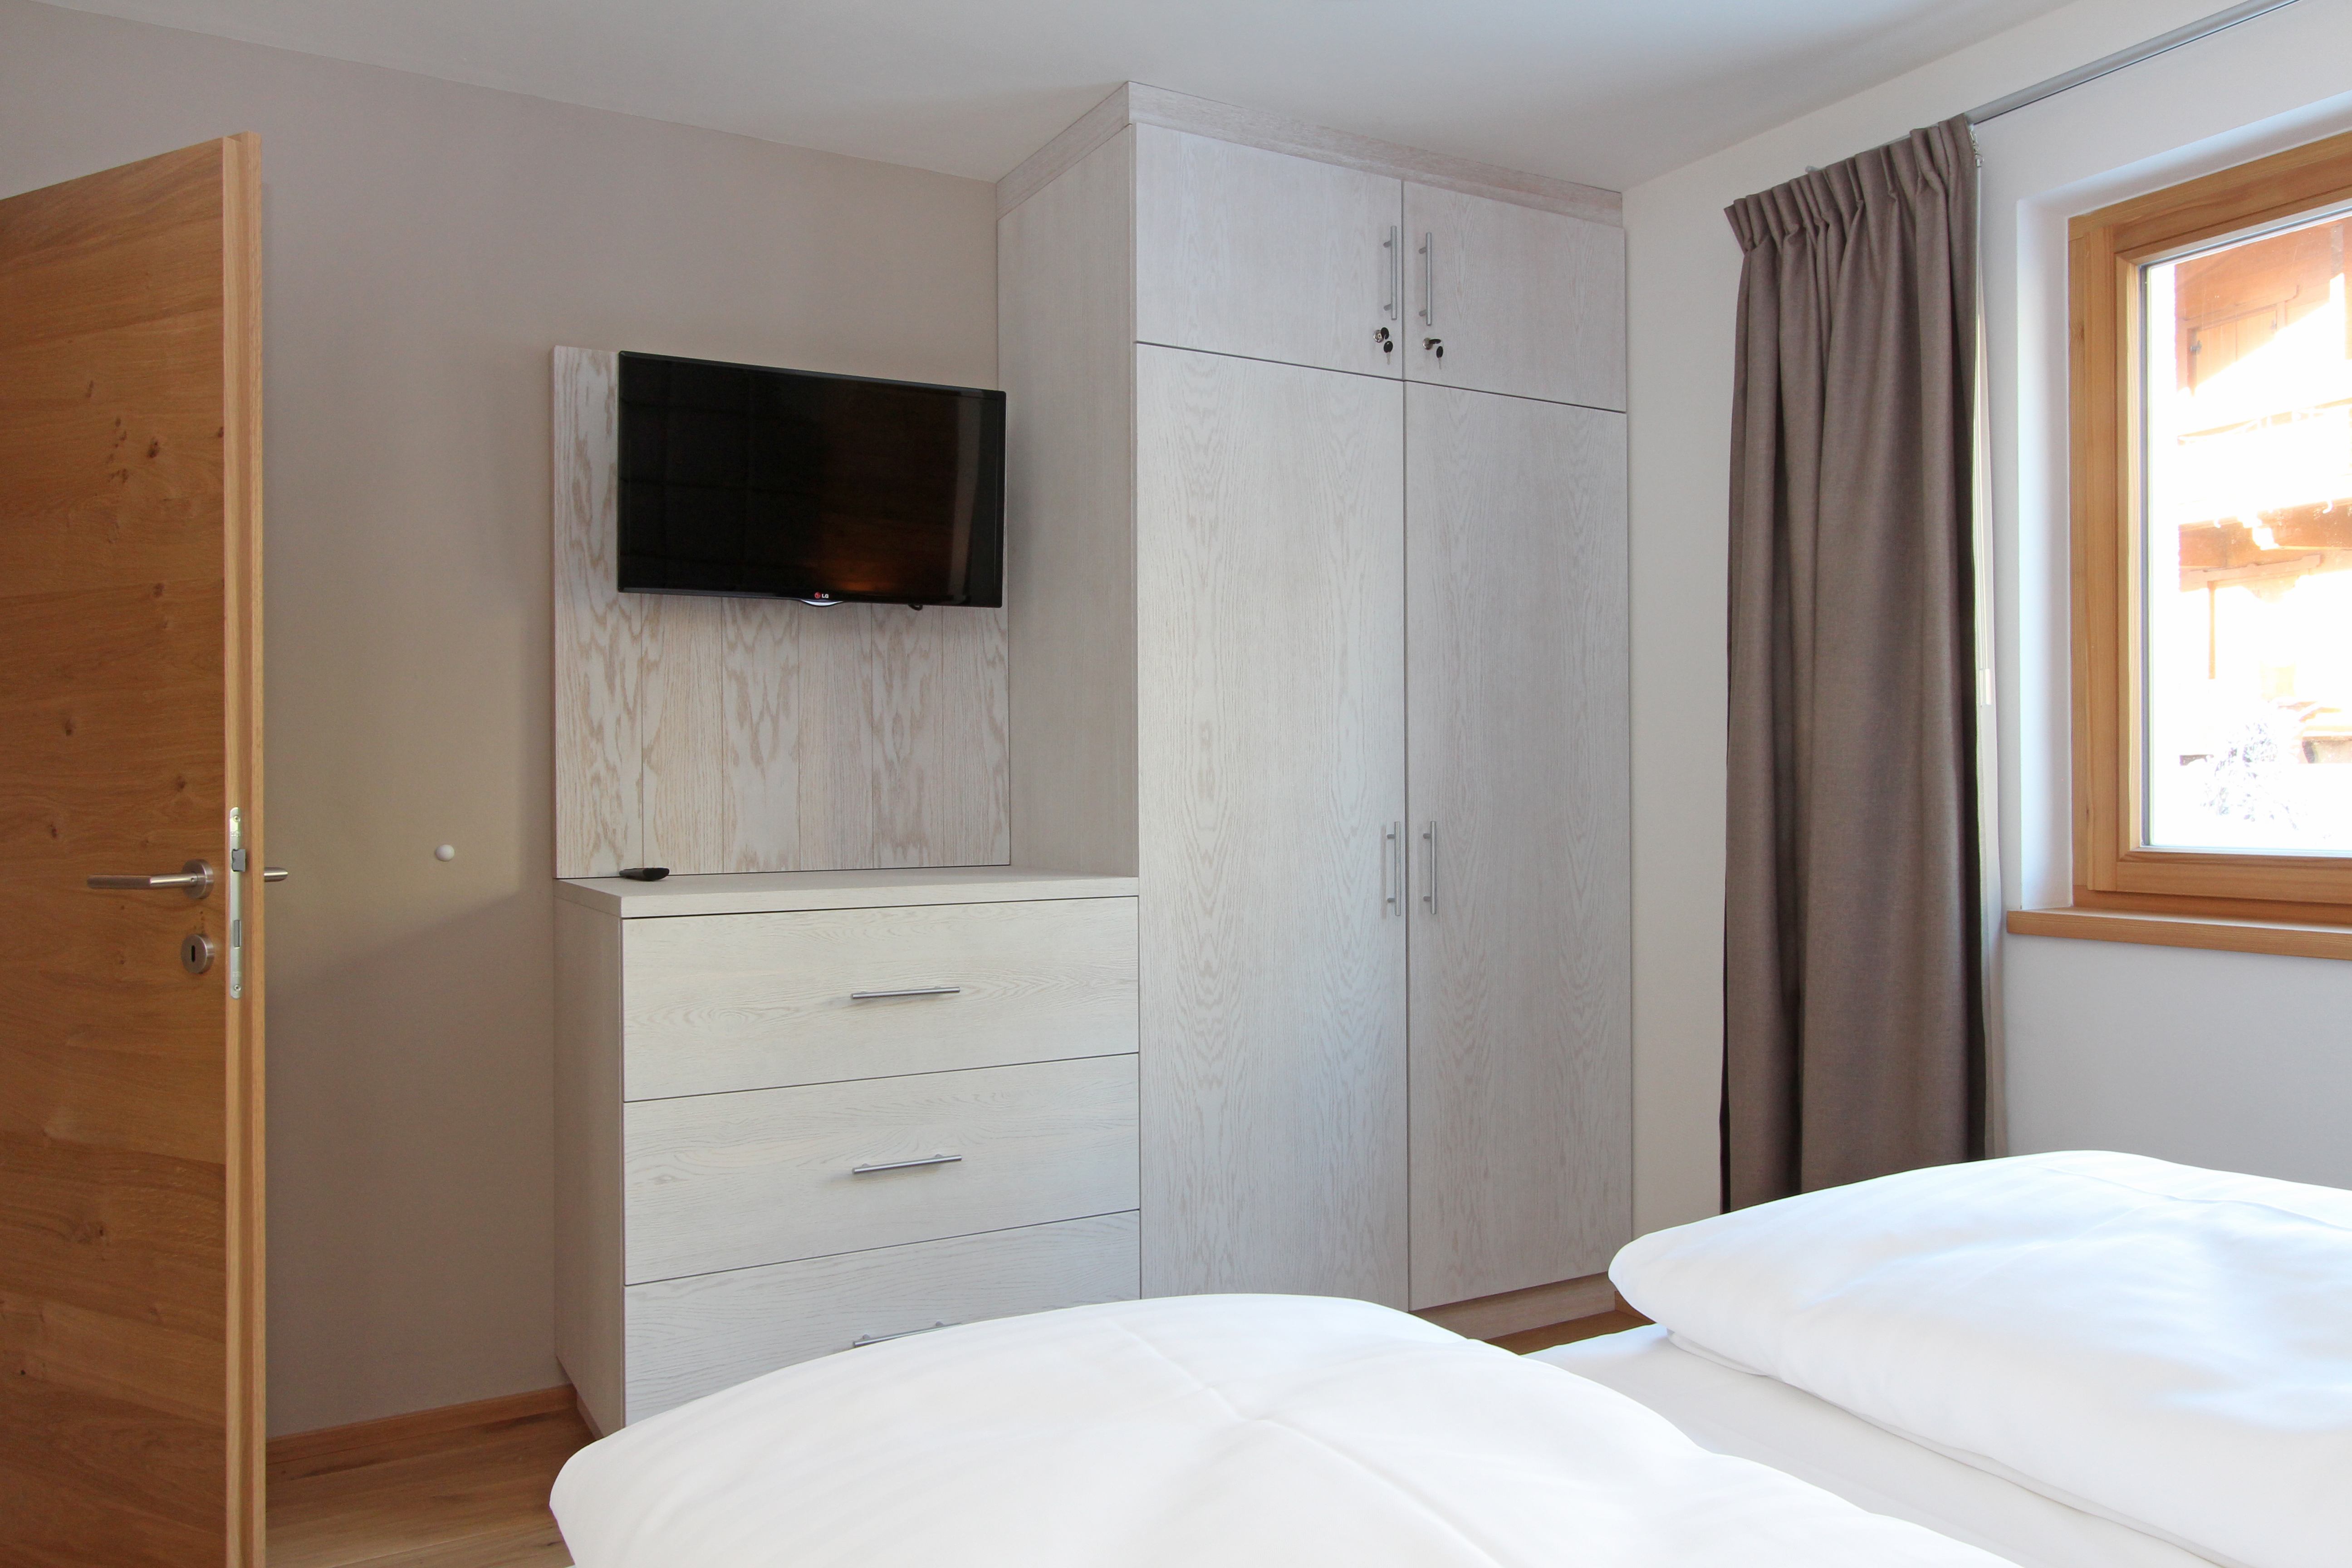 Zimmer Ausstattung - Lodge 2 - Mountain Lodge Leogang